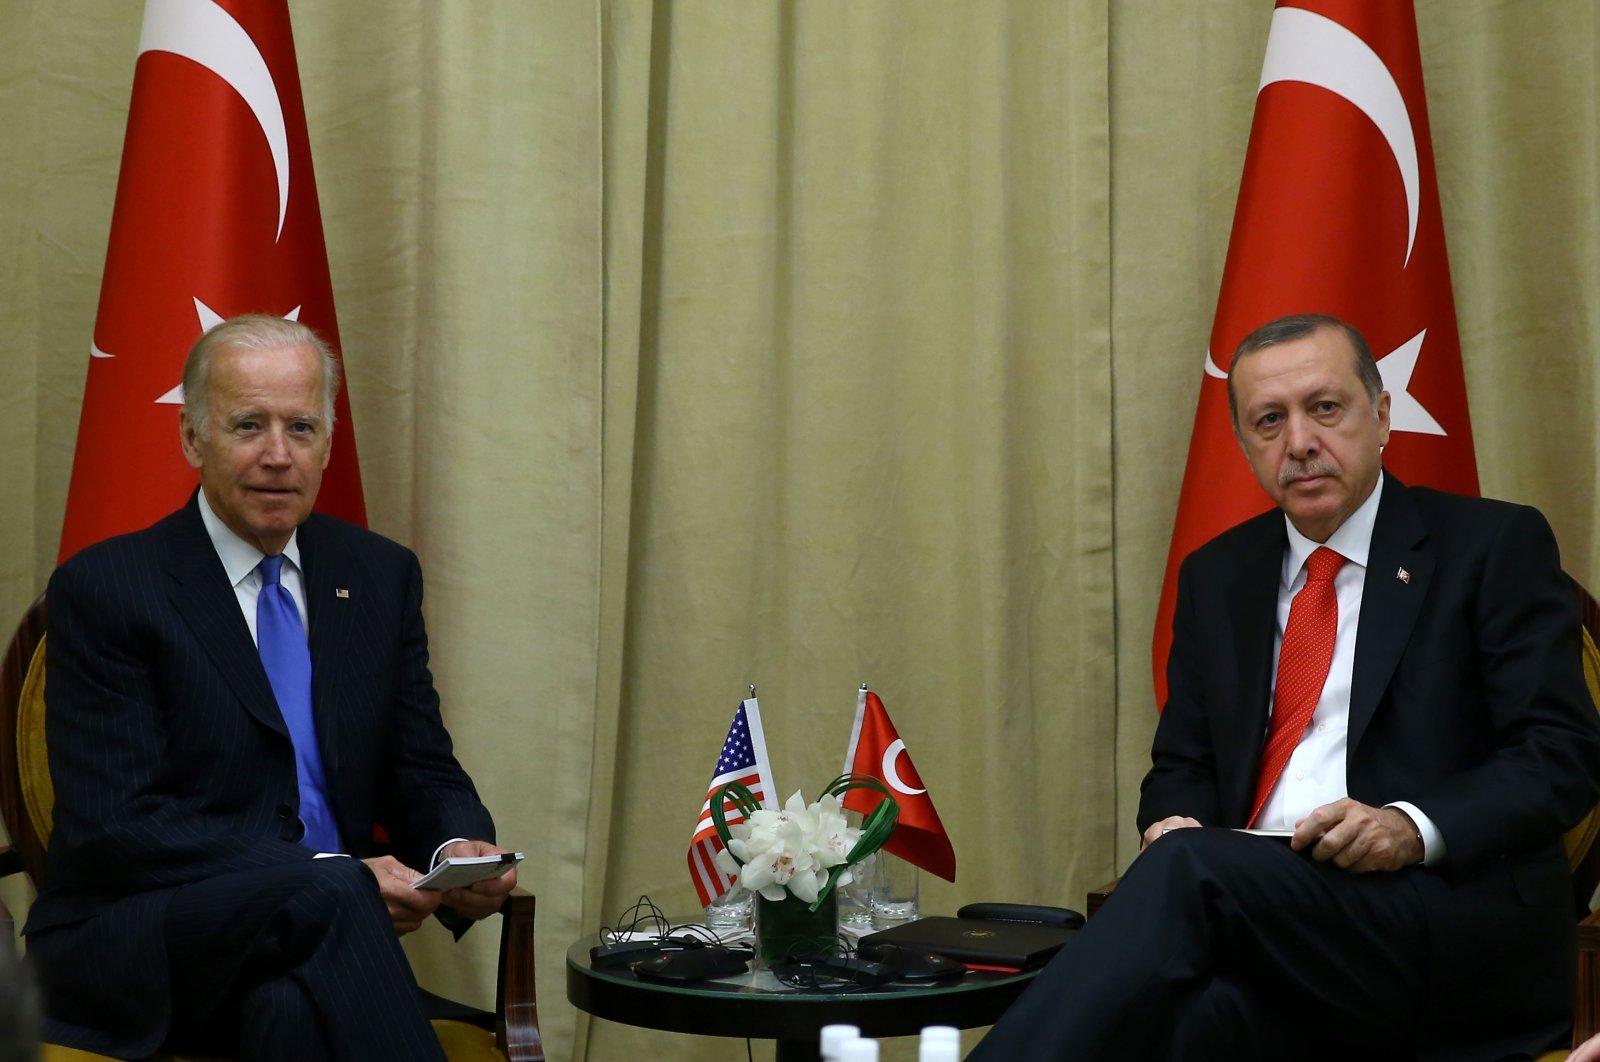 President Recep Tayyip Erdoğan with U.S. President Joe Biden, then the Vice President of U.S. in 2016, New York, (Photo courtesy of Turkish Presidency)